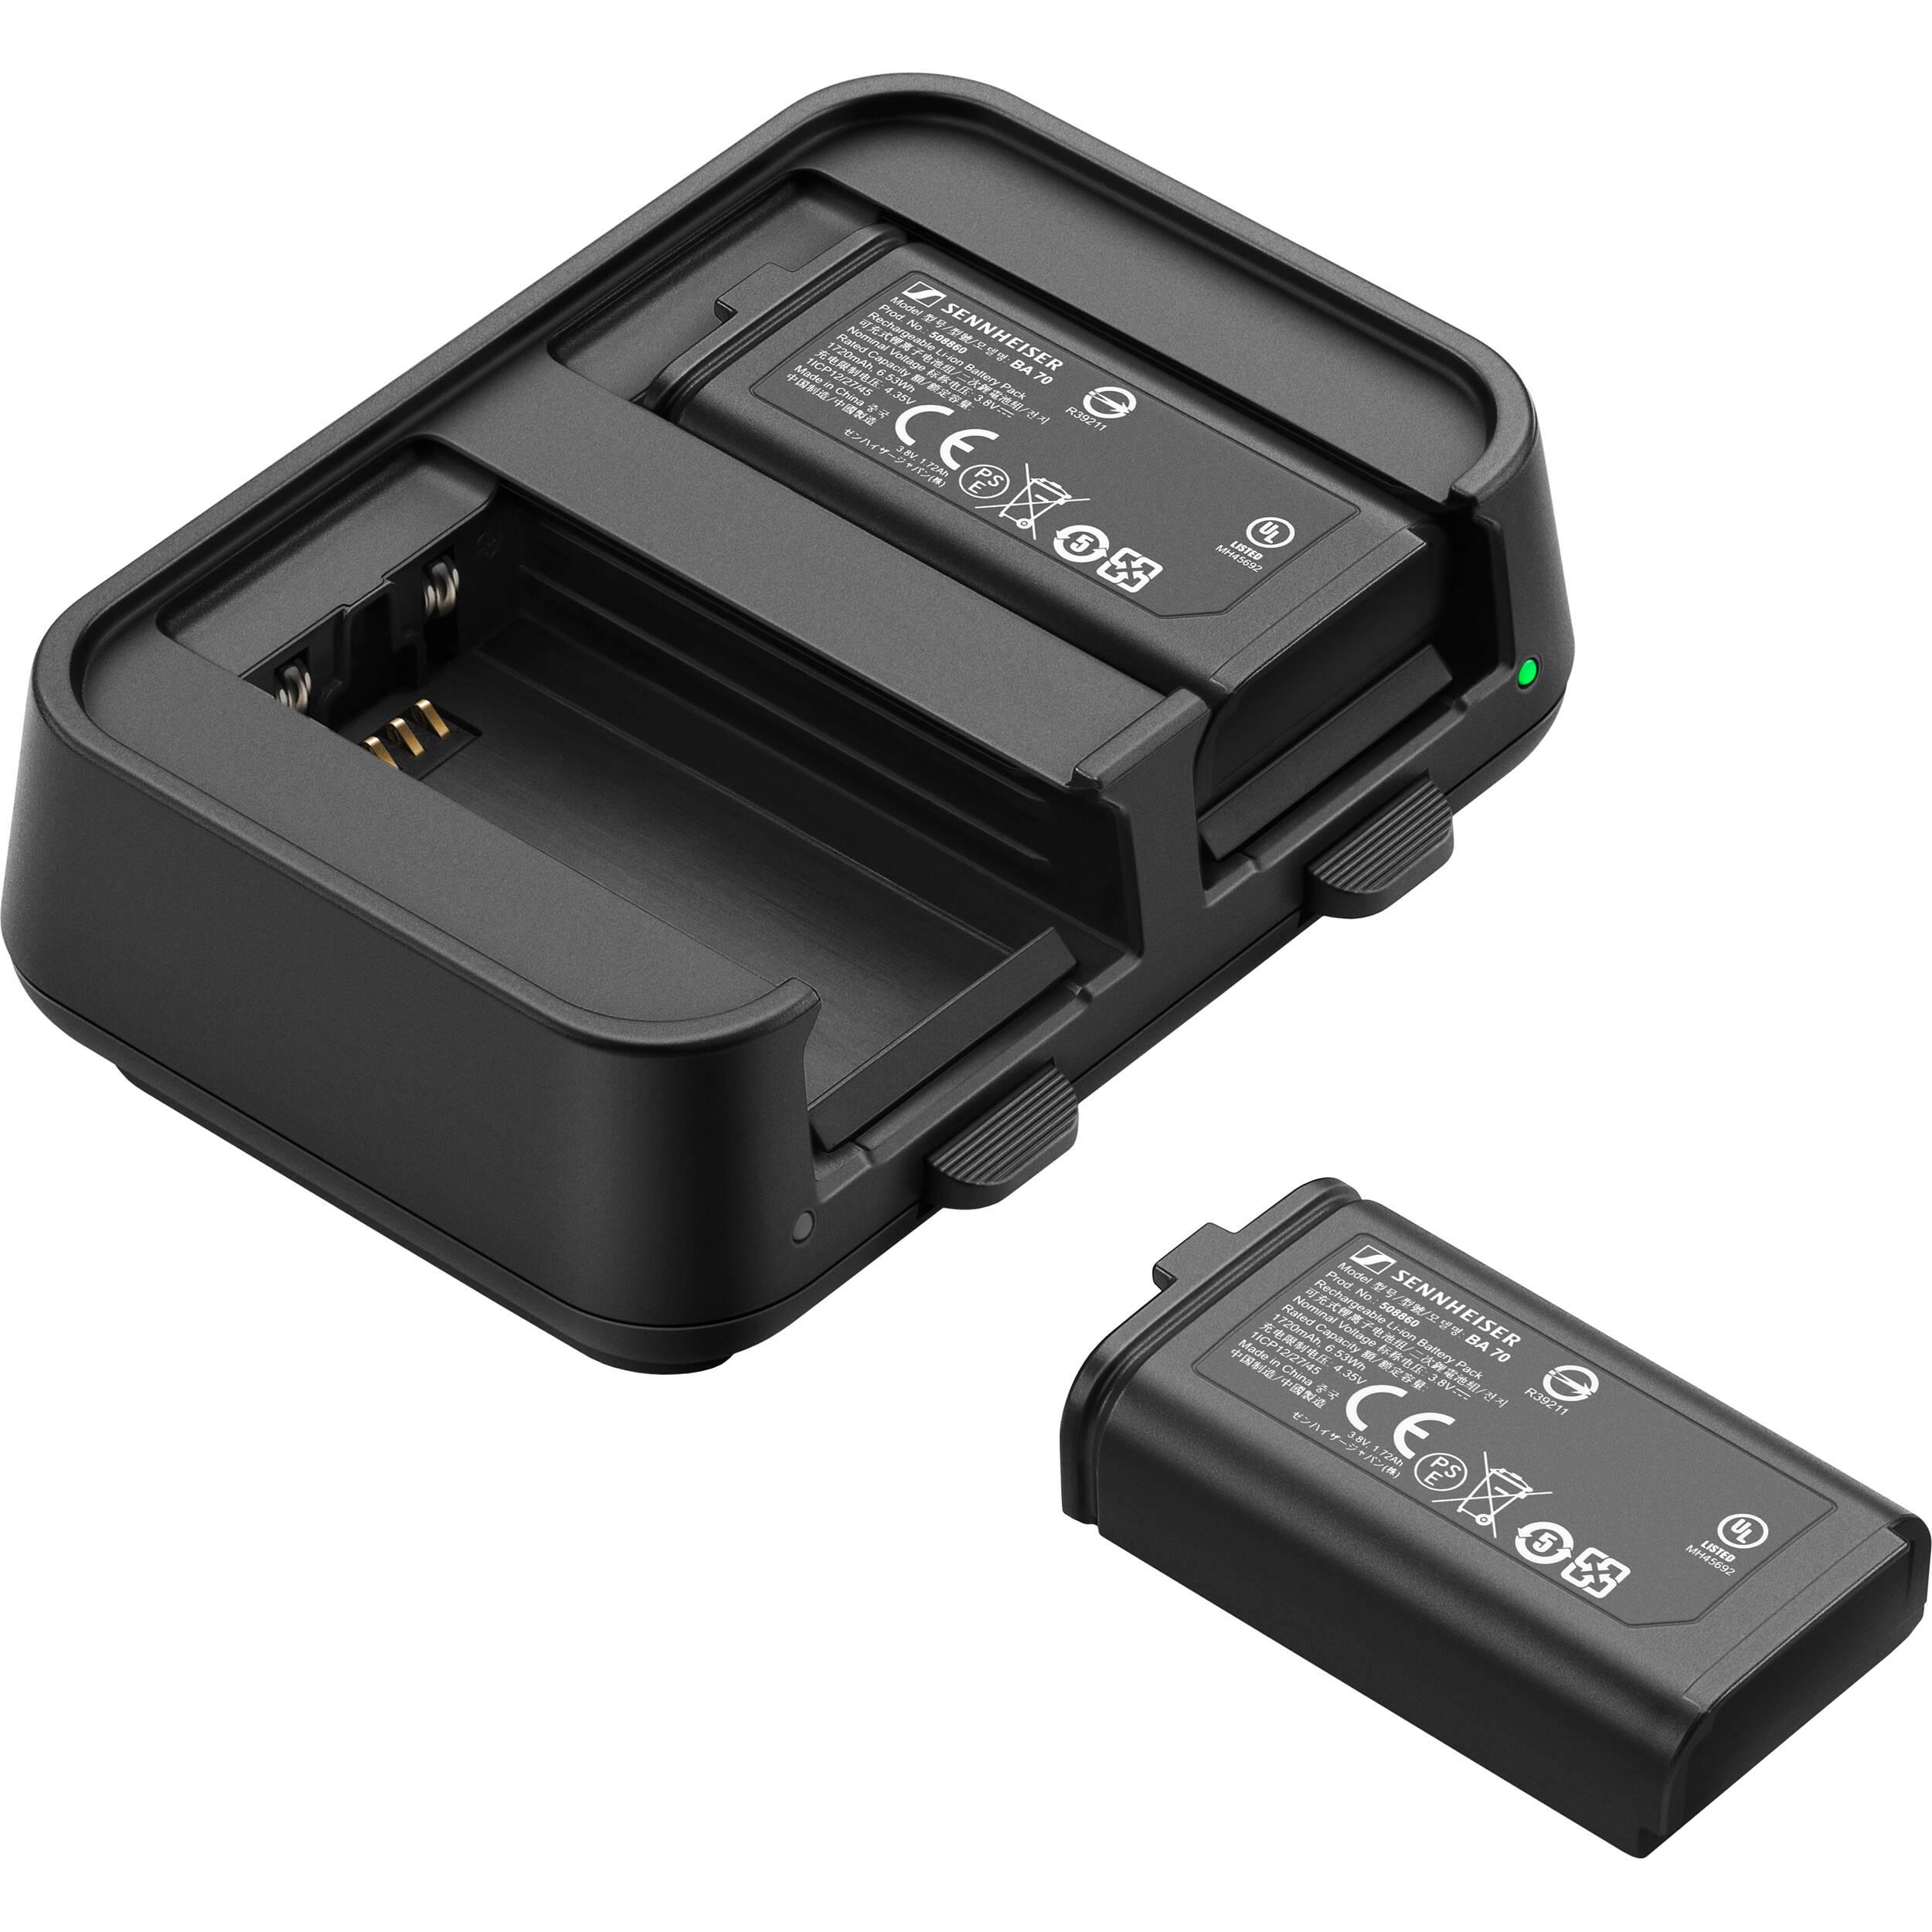 sennheiser-ew-d-charging-set--dual-battery-charger-with-2-ba70-batteries.jpg